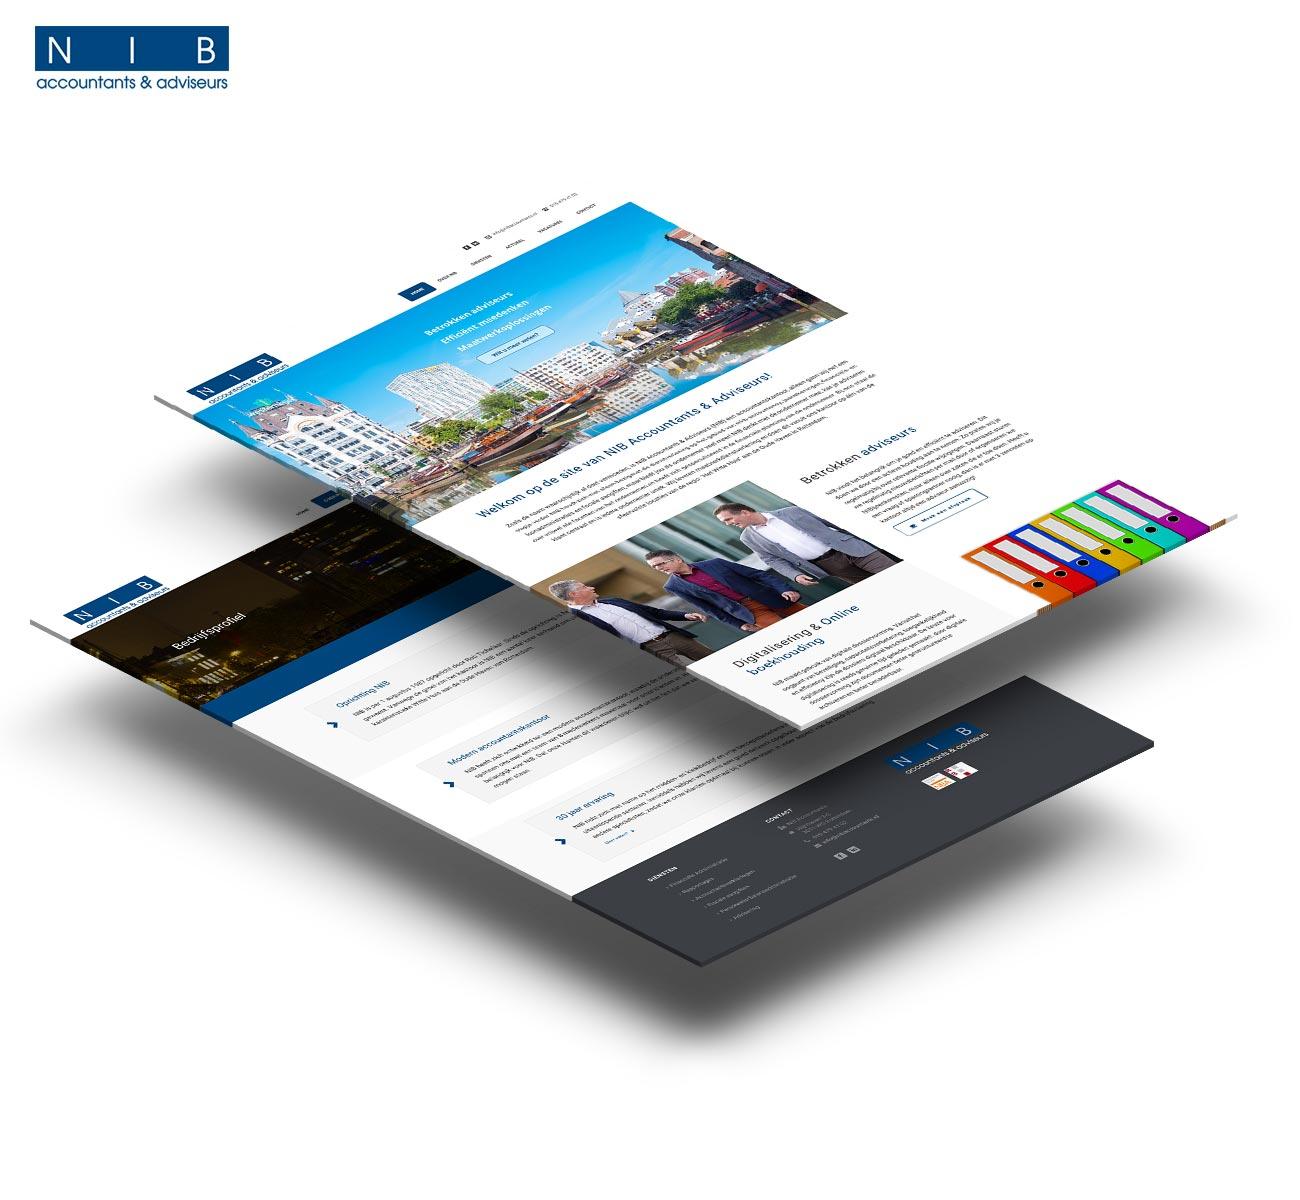 NIB Accountants en adviseurs website